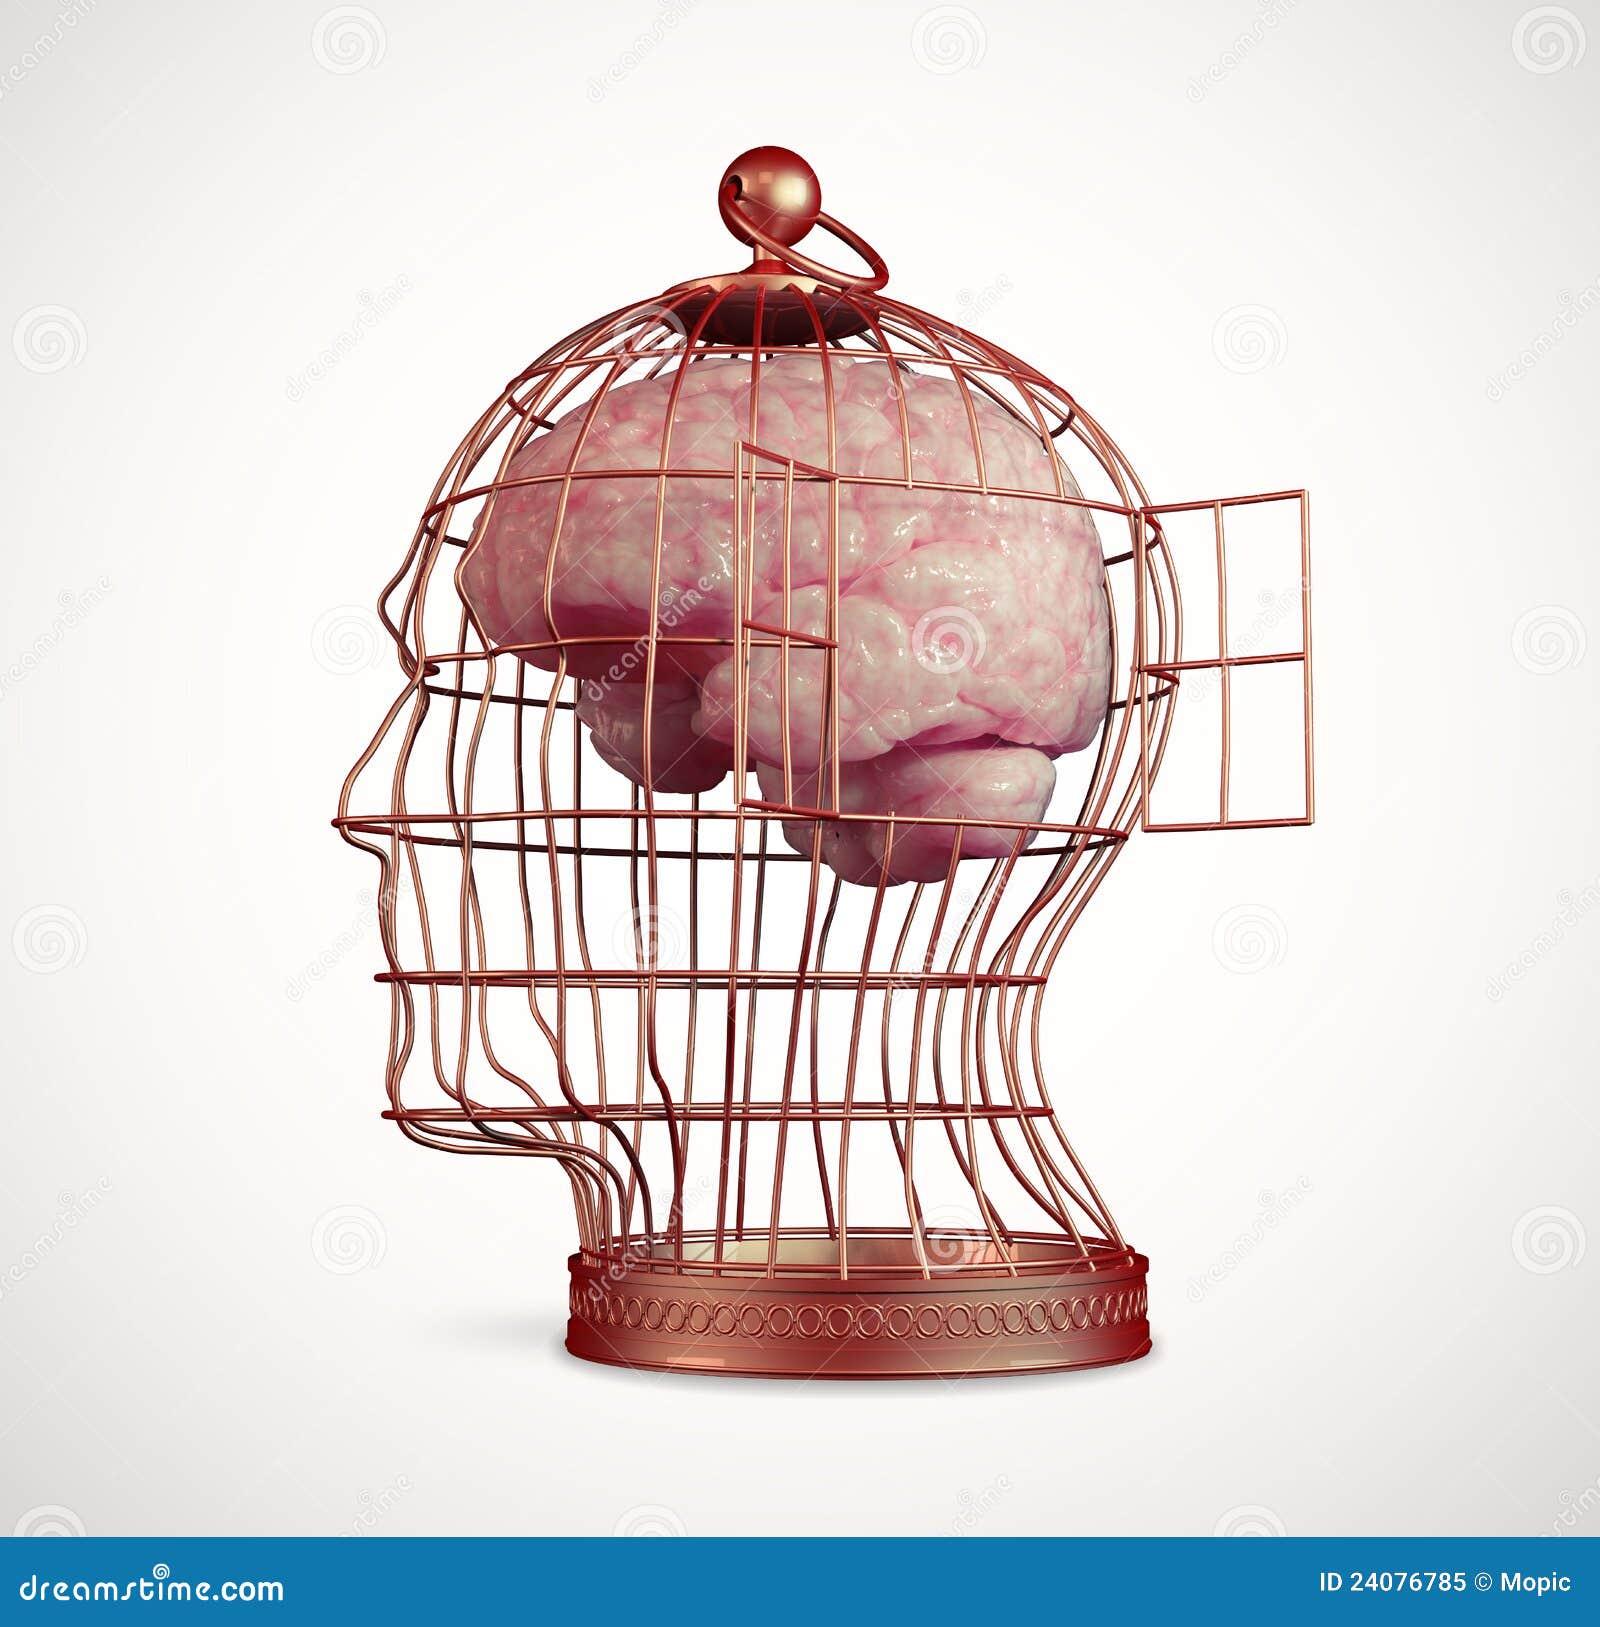 Bird brain anatomy - Animal Kid